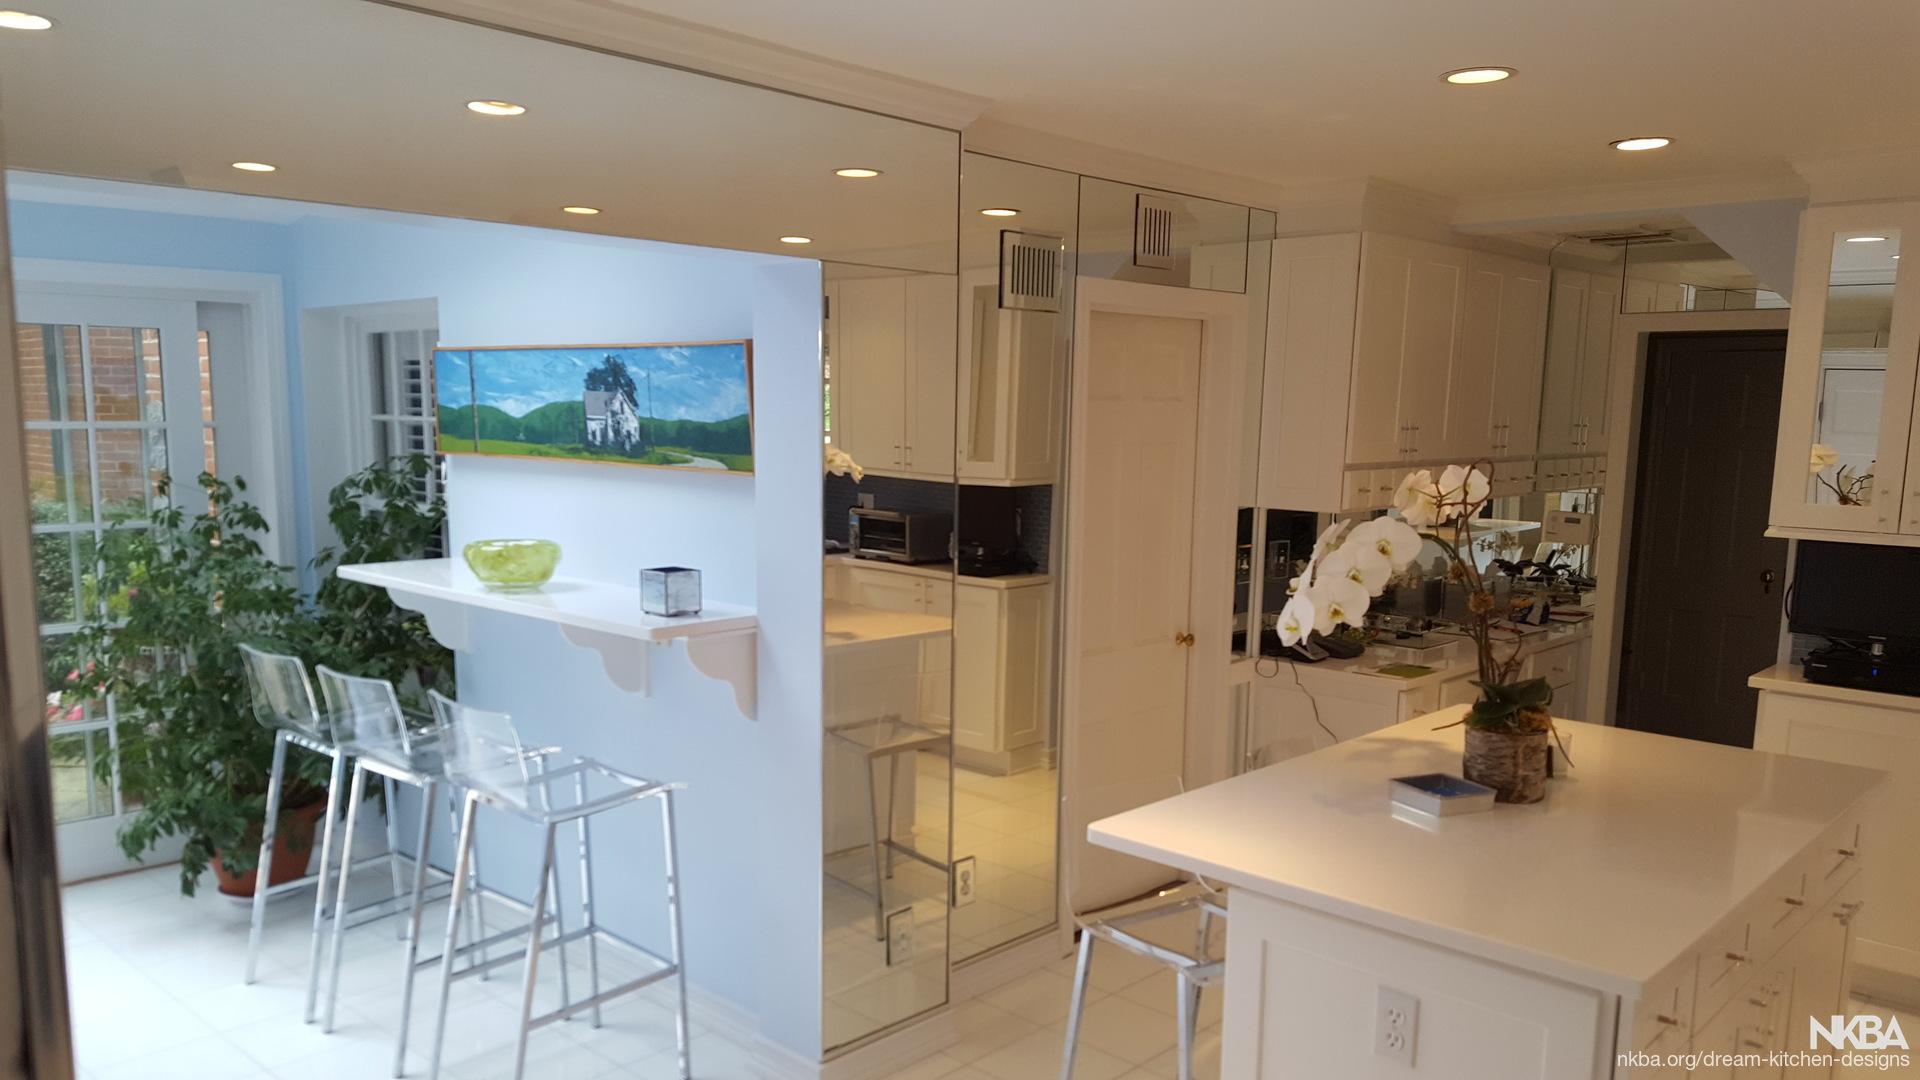 Dream Kitchen Designs   NKBA